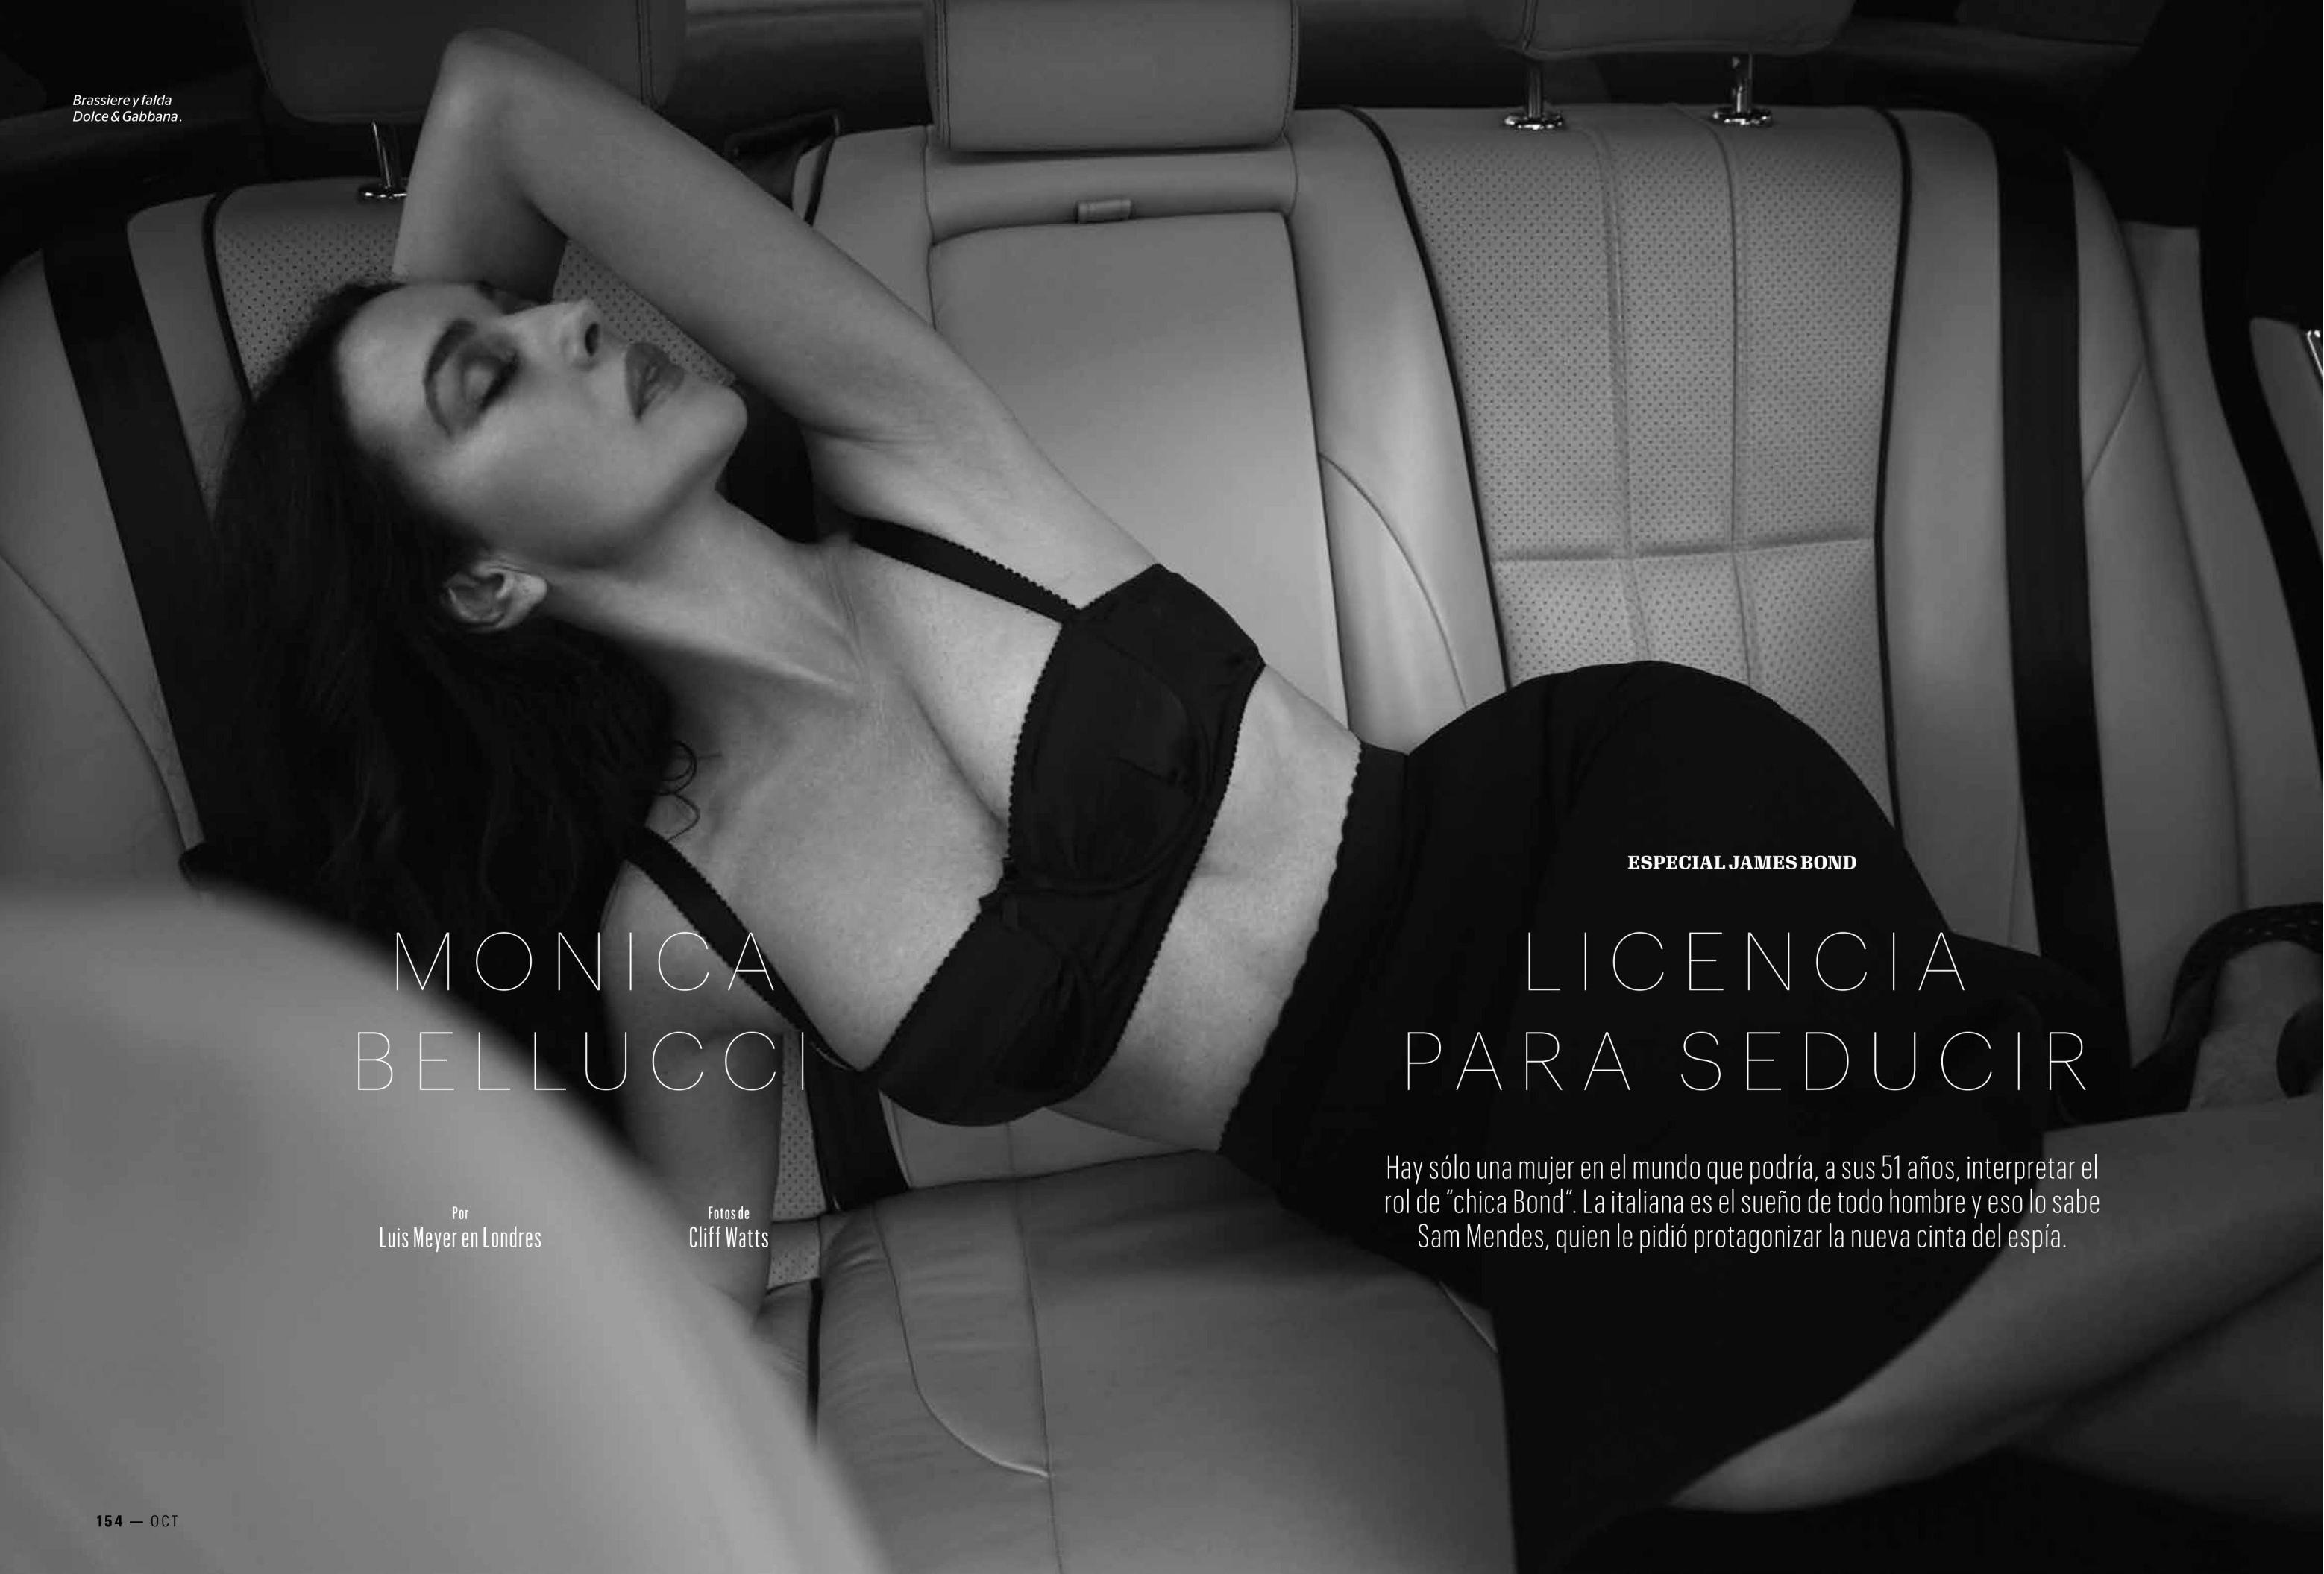 Monica Bellucci adultos